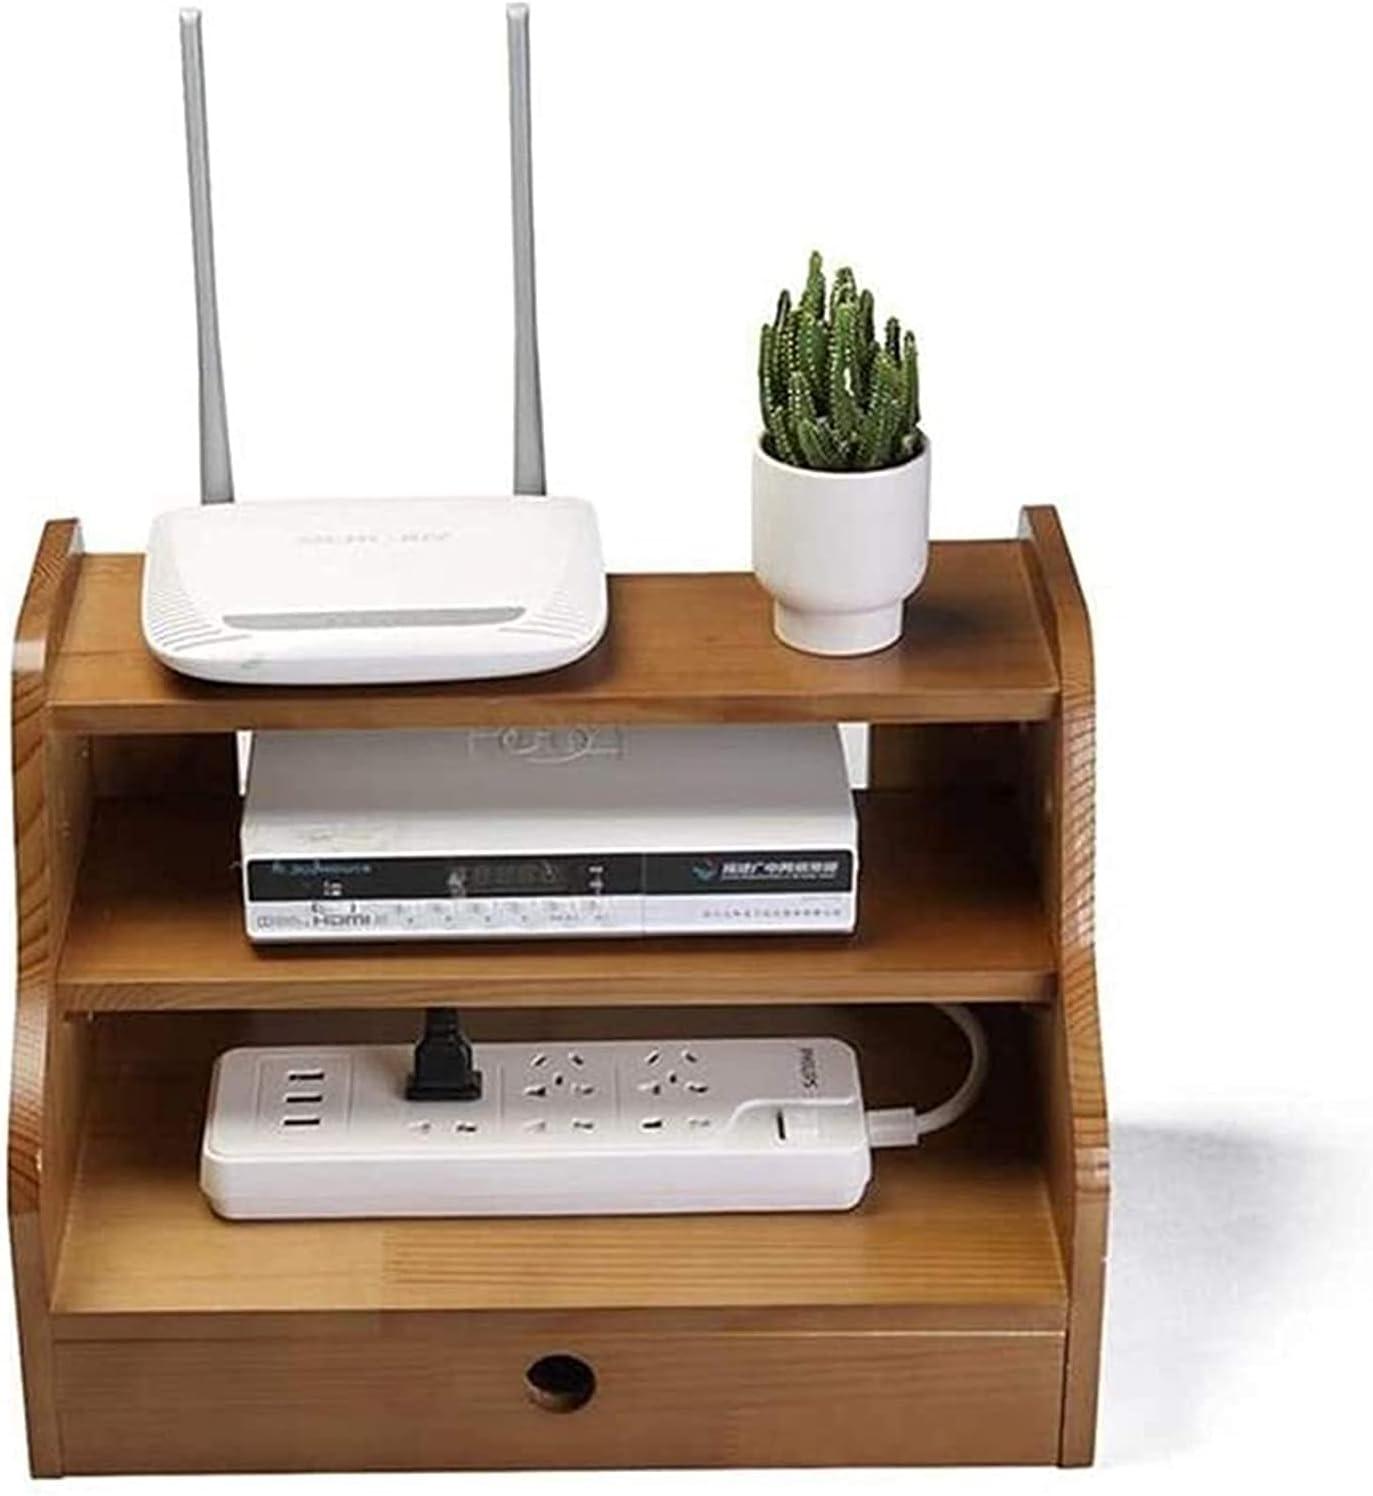 FMOGE WiFi Router Rack mart Box Set-top Wal Seasonal Wrap Introduction Shelves